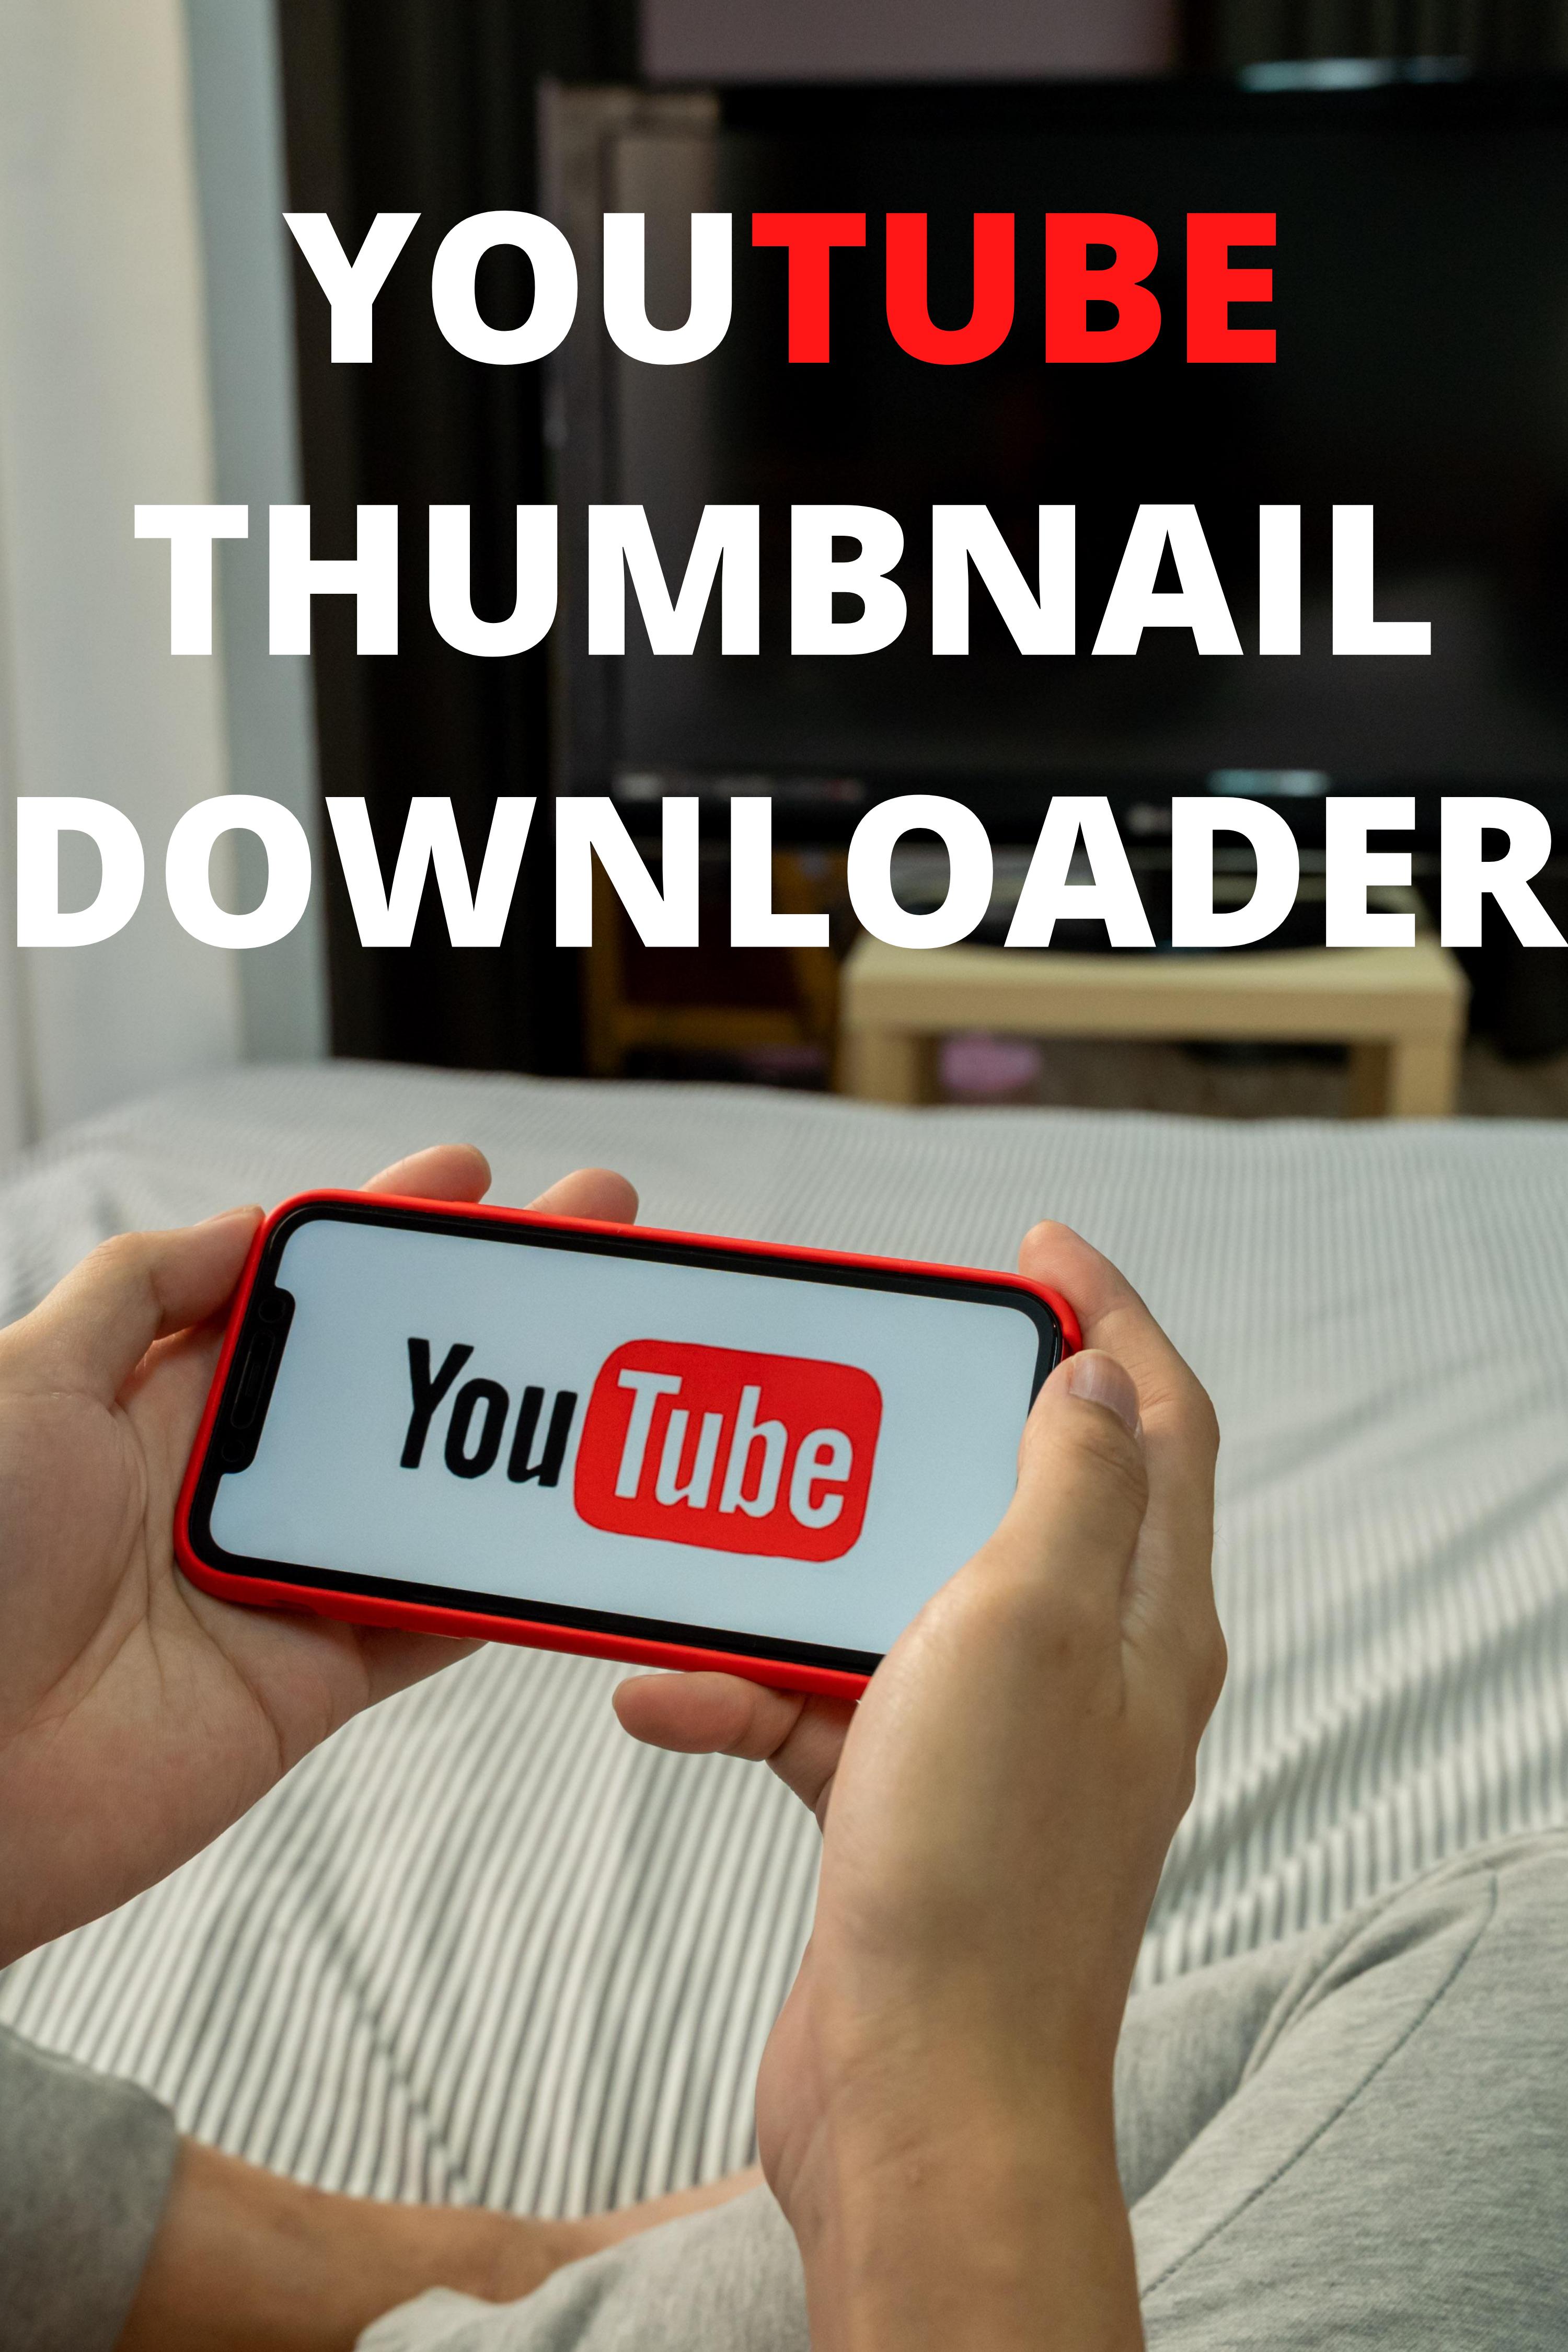 Youtube Thumbnail Downloader in 2020 Youtube thumbnail